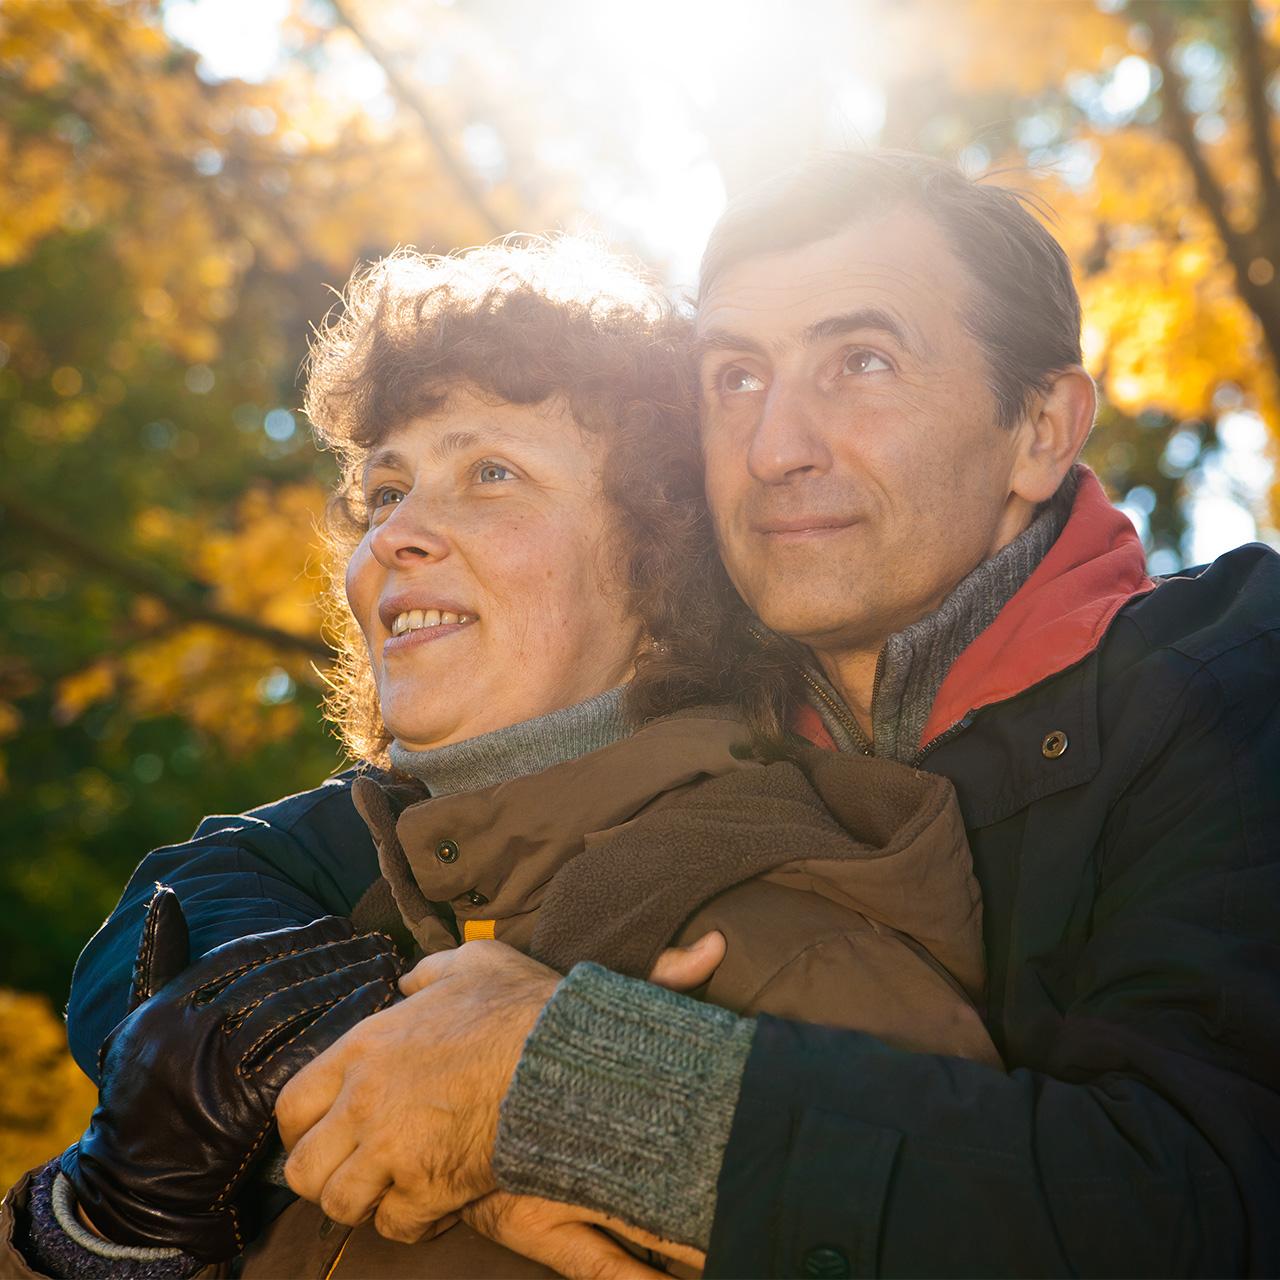 Hausarzt Hoepcke in Güstrow: Präventionsmedizin